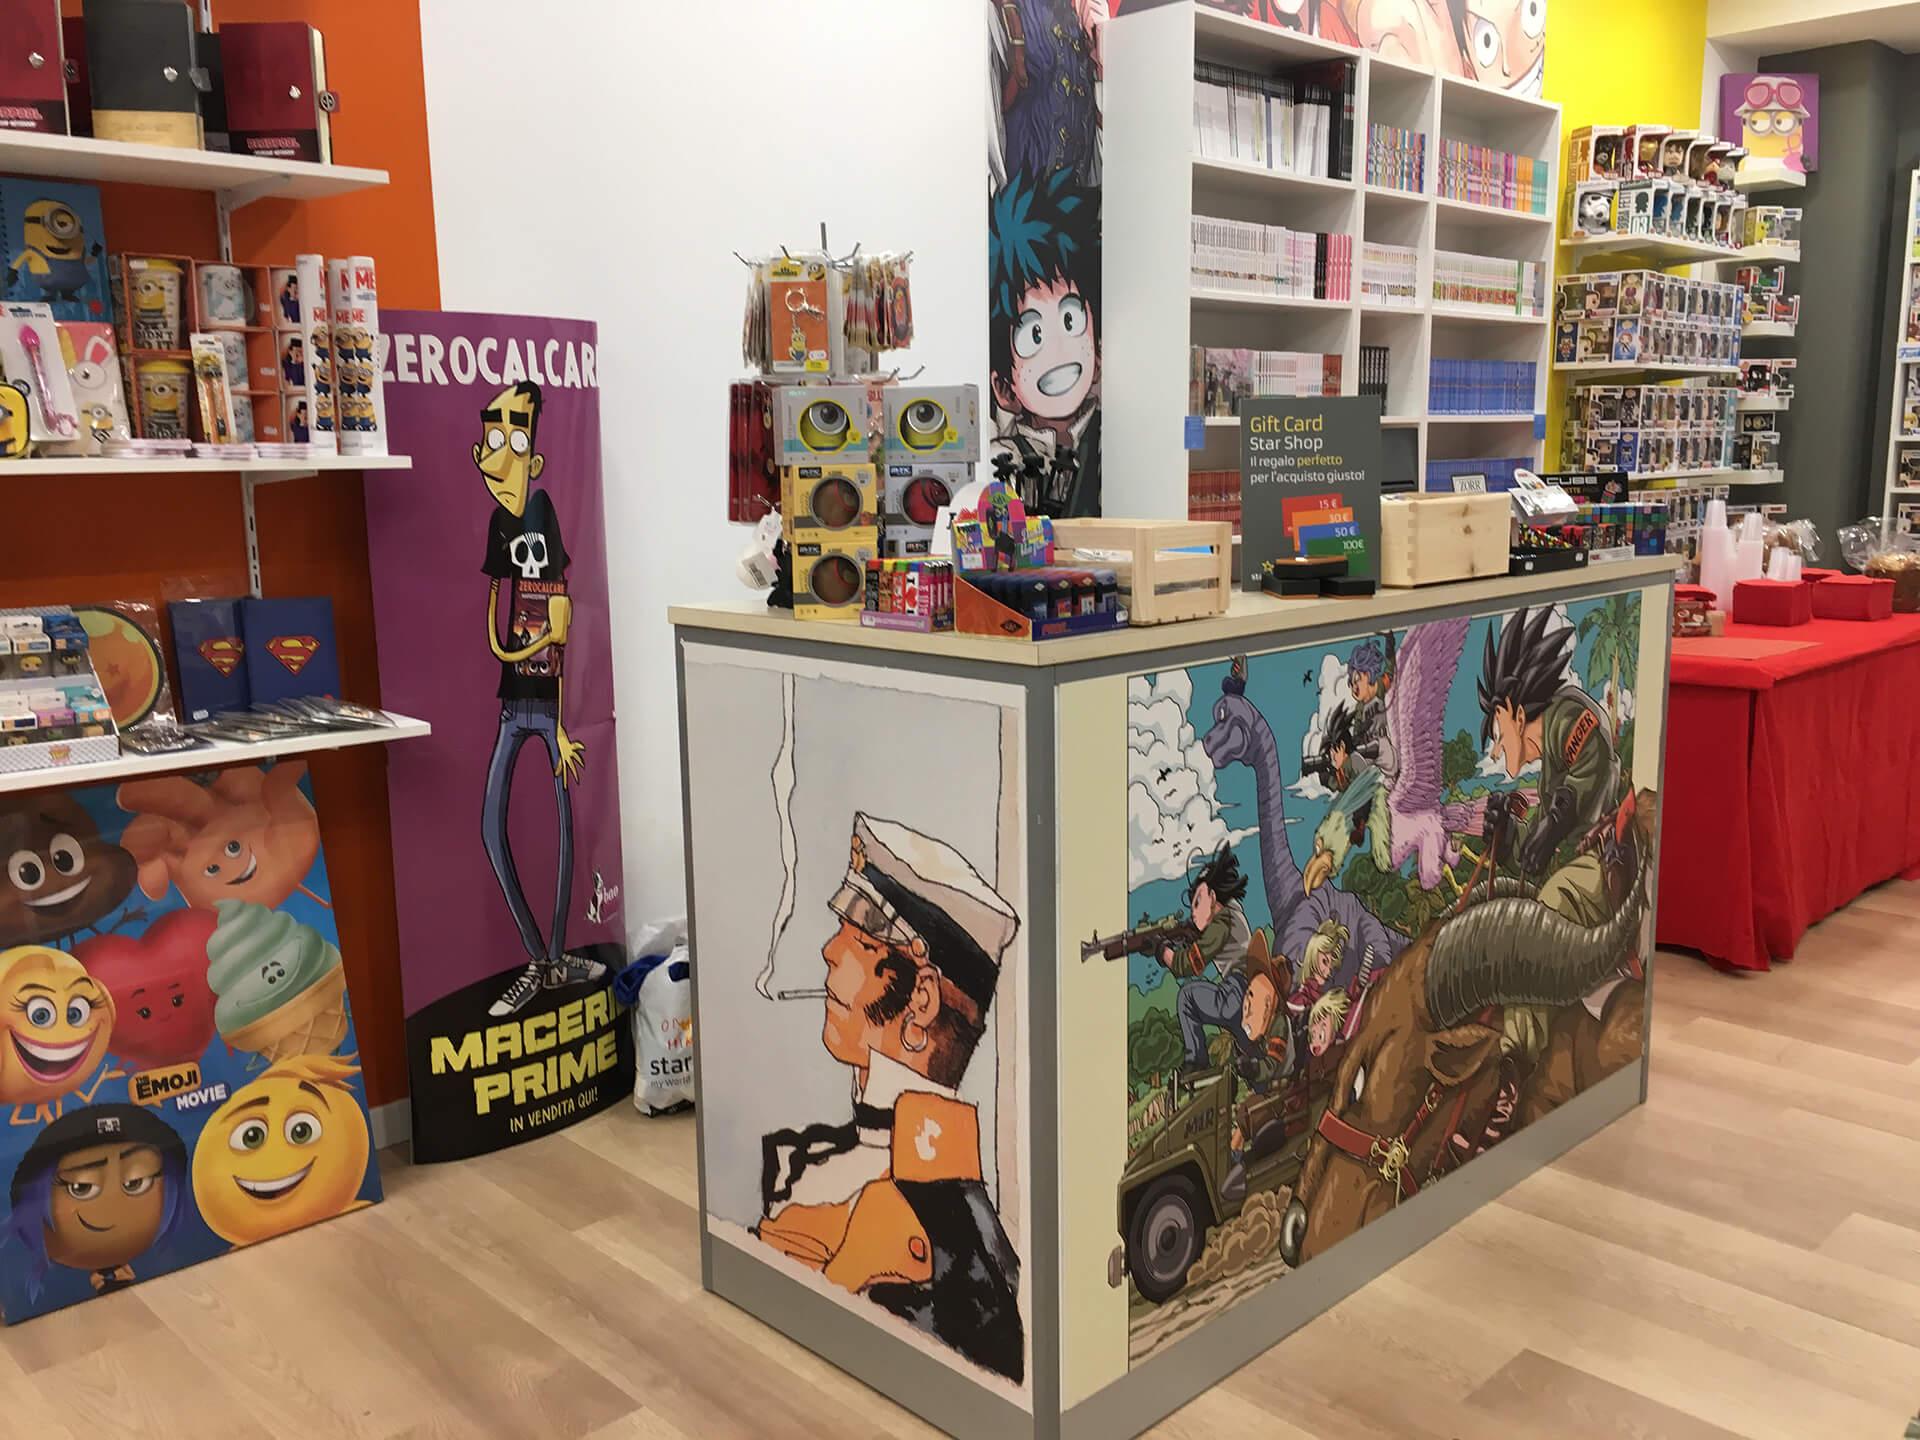 Allestimenti Grafox - Shop & Food - Star Shop Perugia